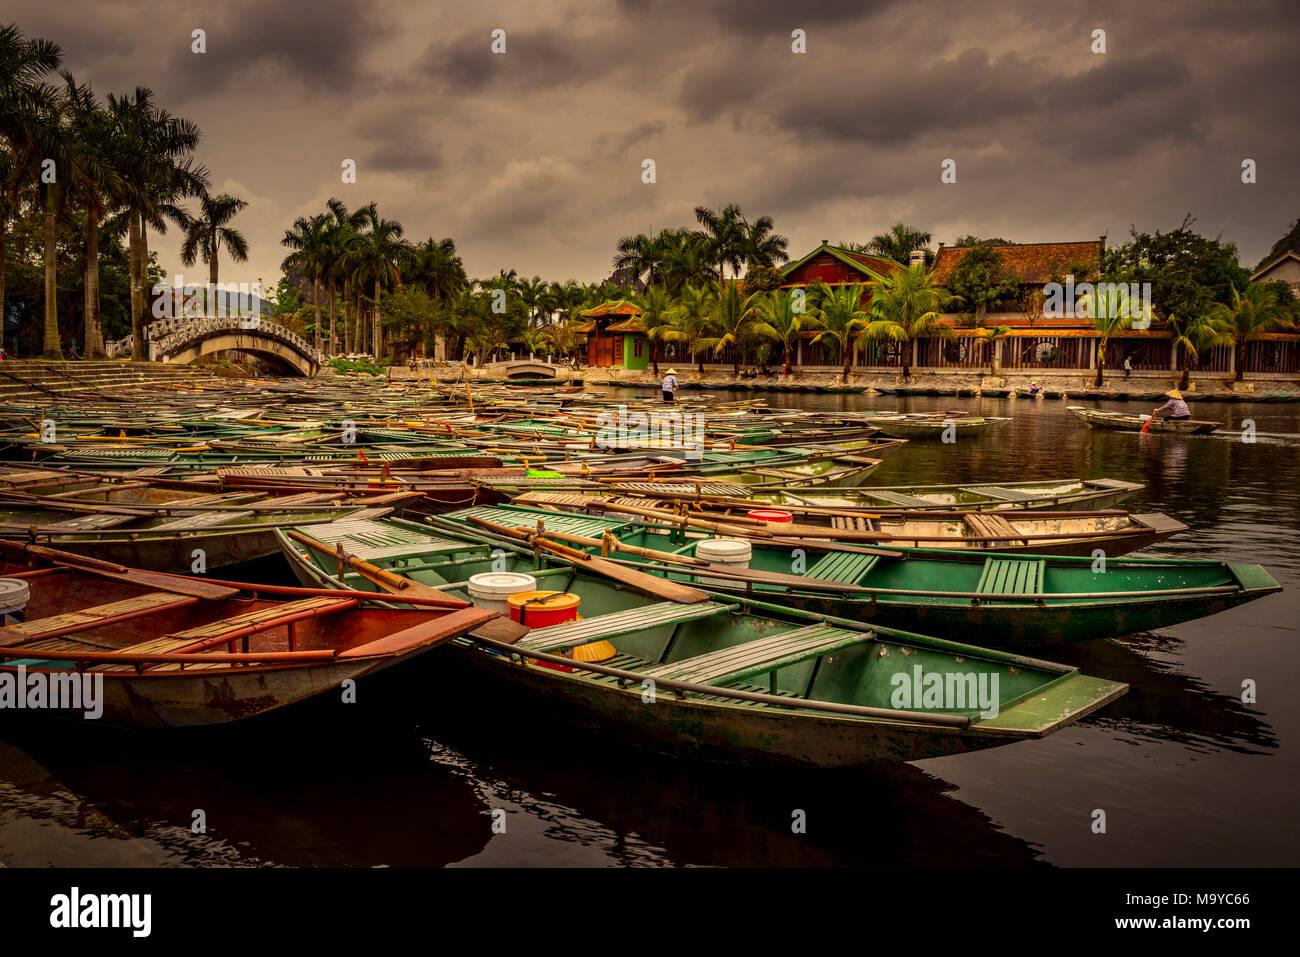 Asien, Vietnam, Ninh Binh Provinz, Halong-Bucht, trocken, trockene Halong-Bucht, Boot, Bootstour - Stock Image